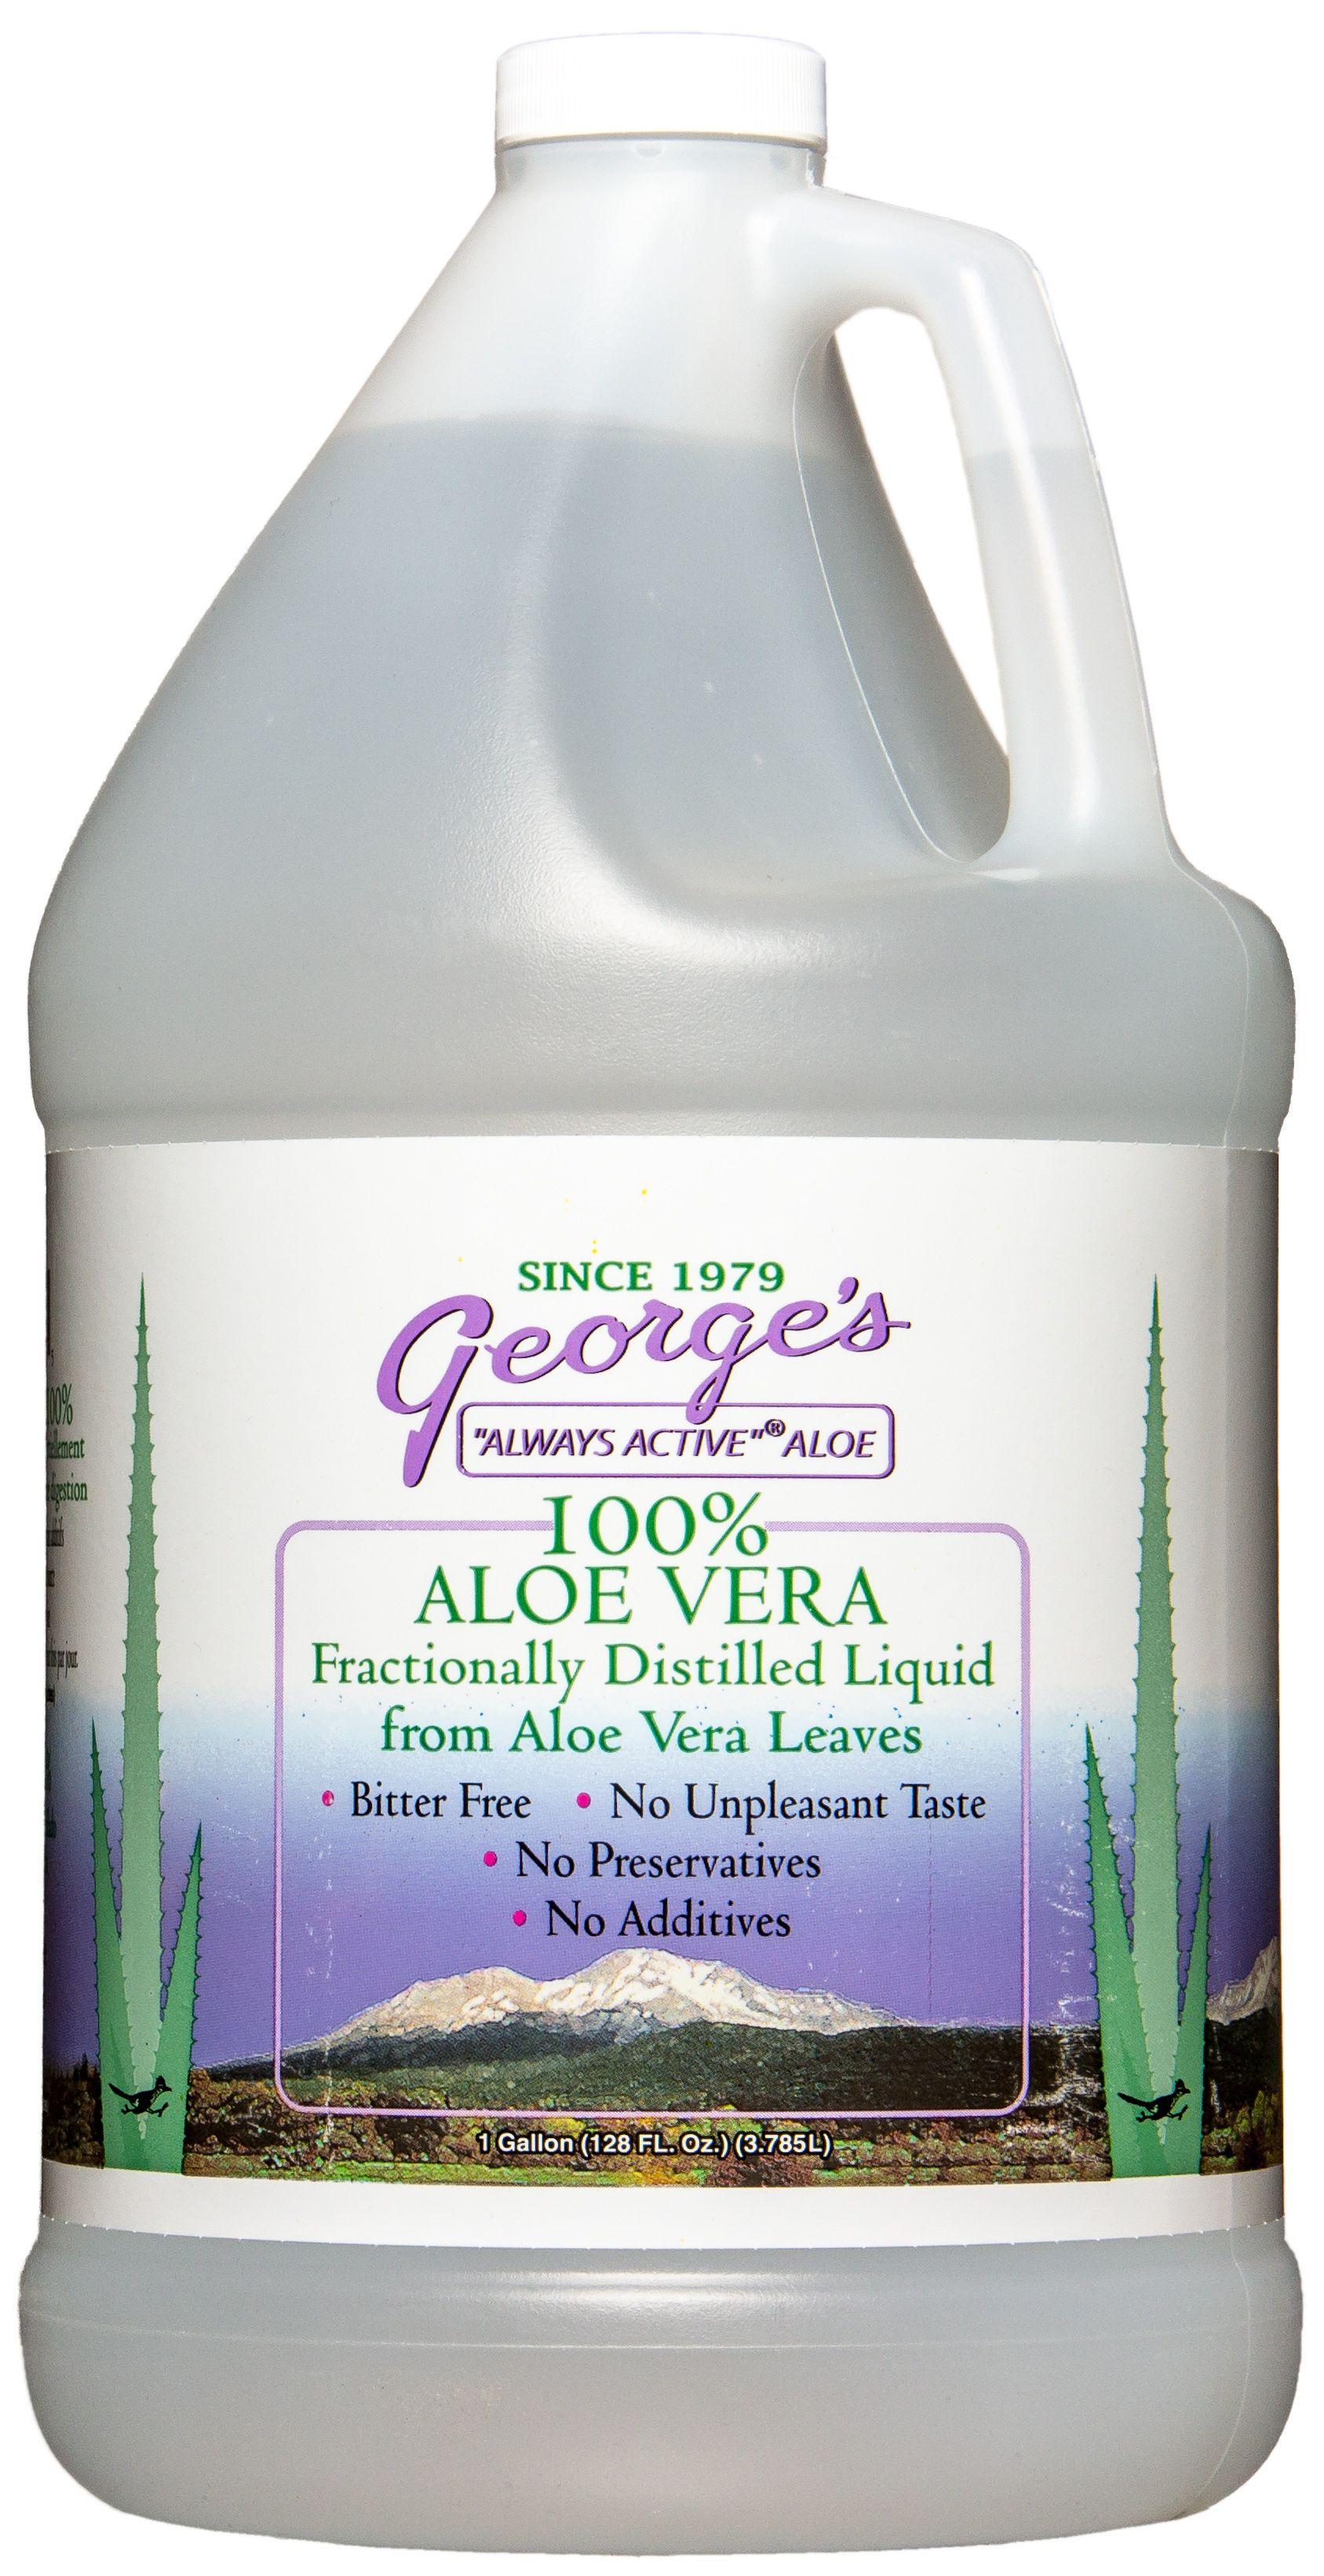 Aloe vera juice 32 floz with images aloe vera juice